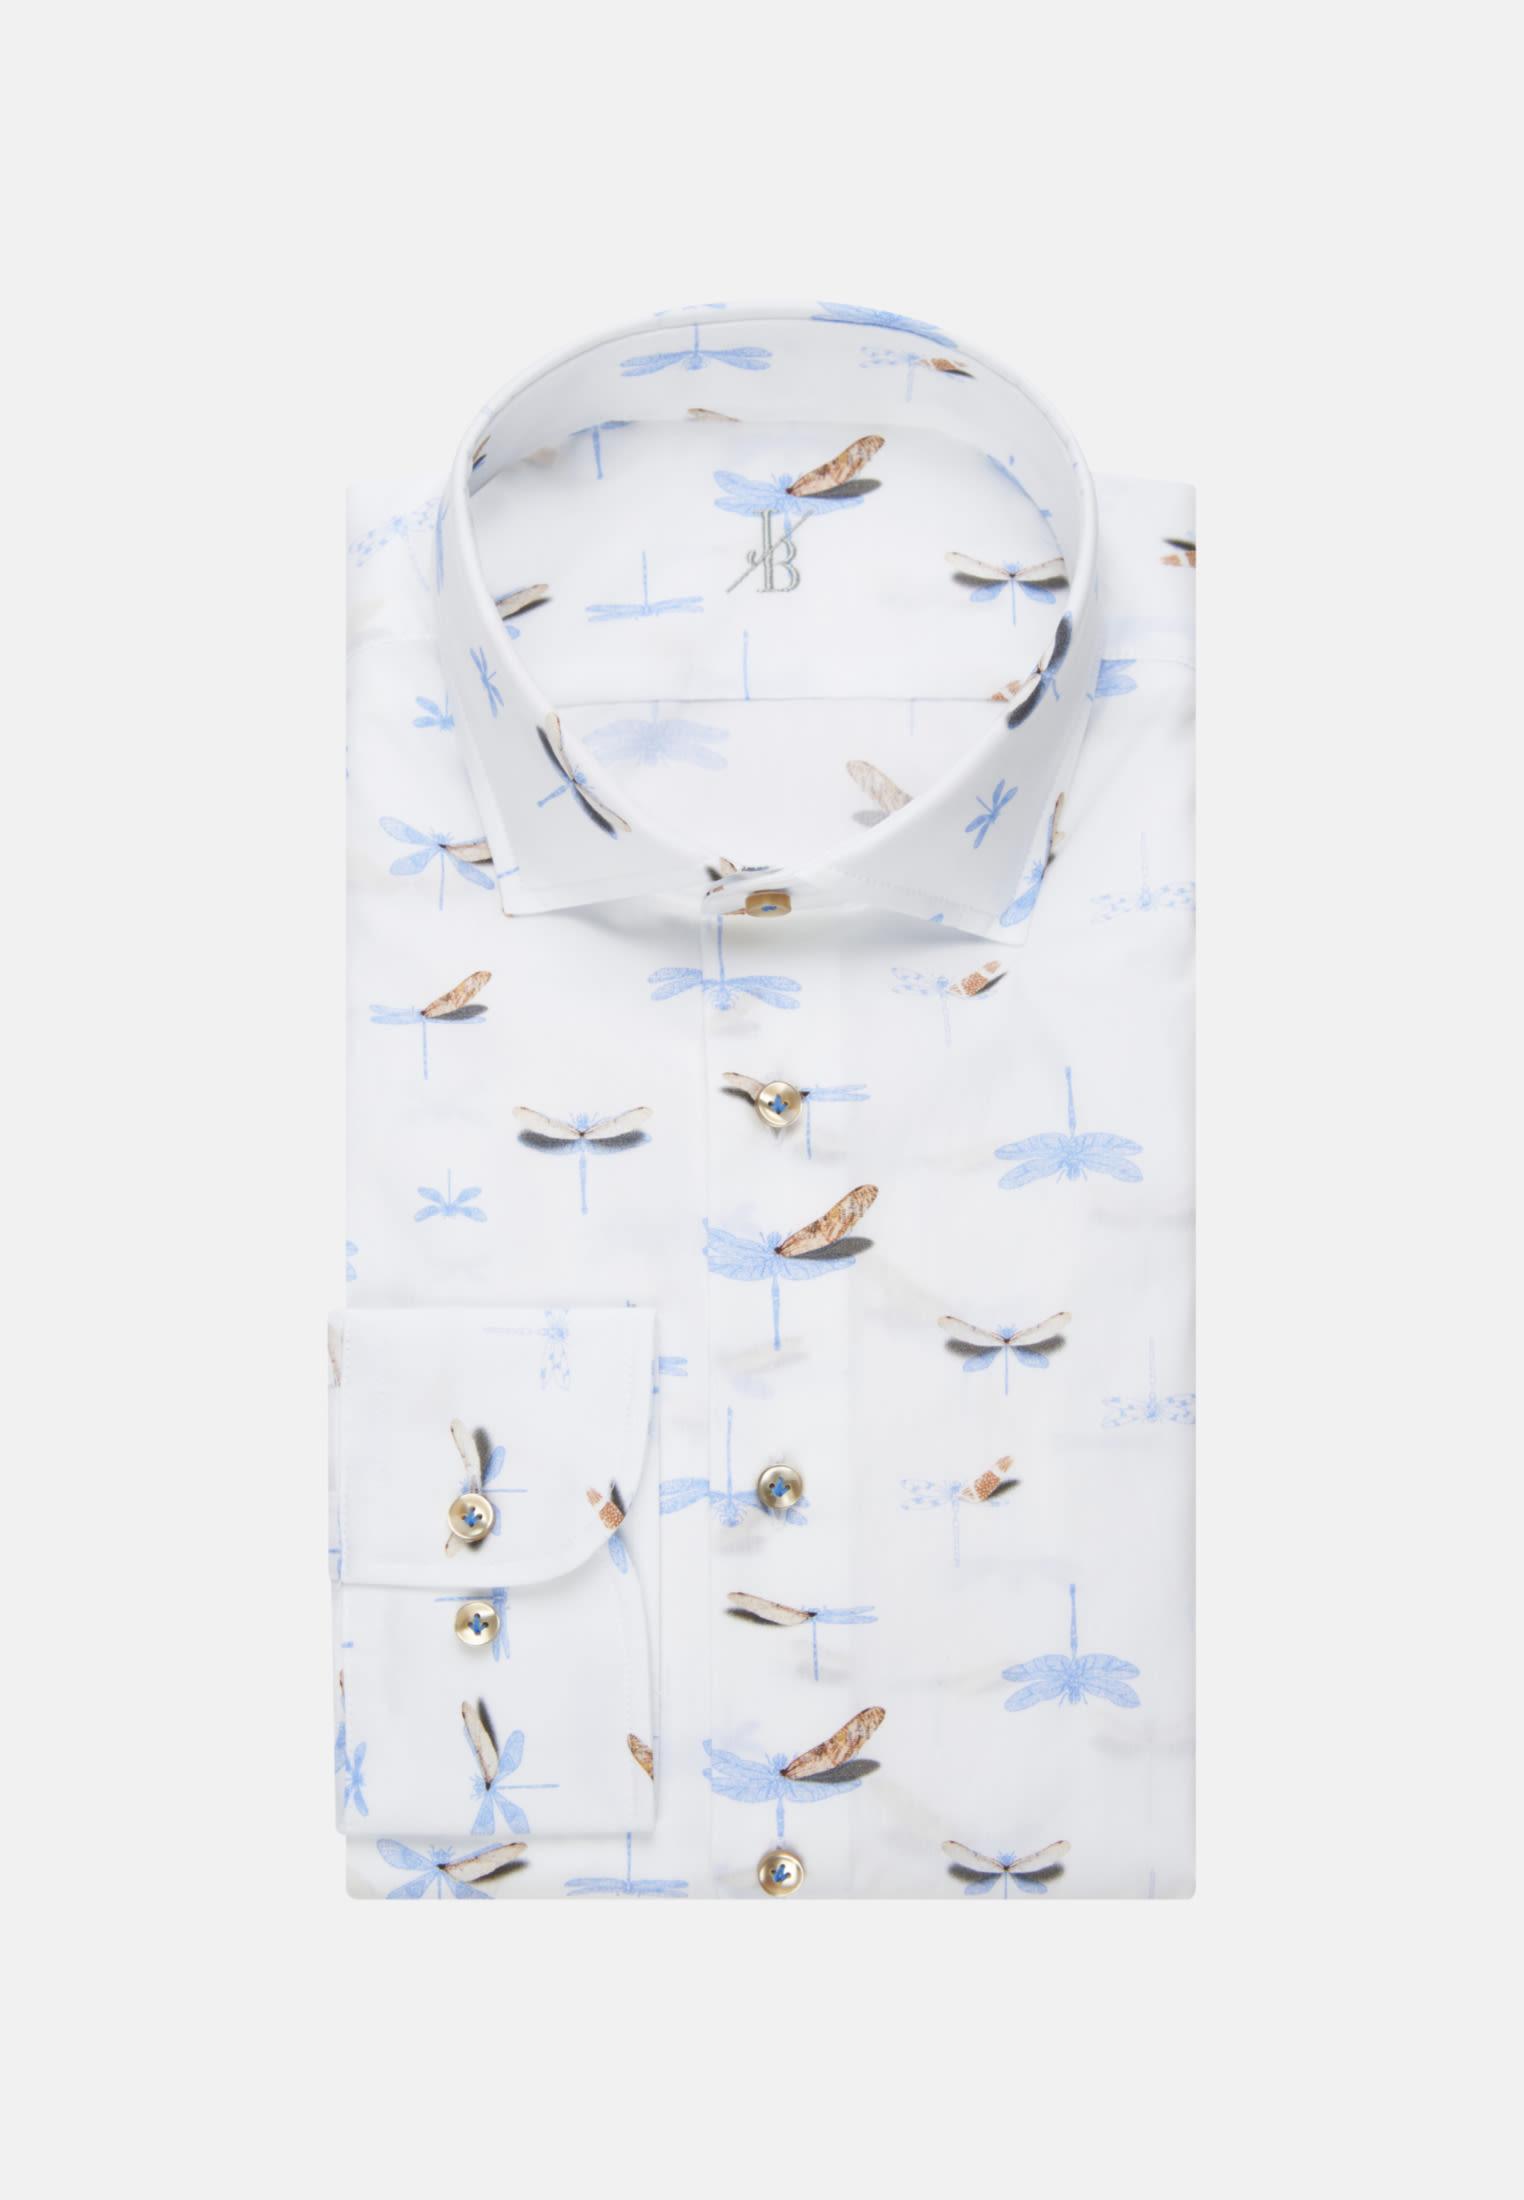 Oxford Smart Casual Hemd in Perfect Fit mit Haifischkragen in Hellblau    Jacques Britt Onlineshop